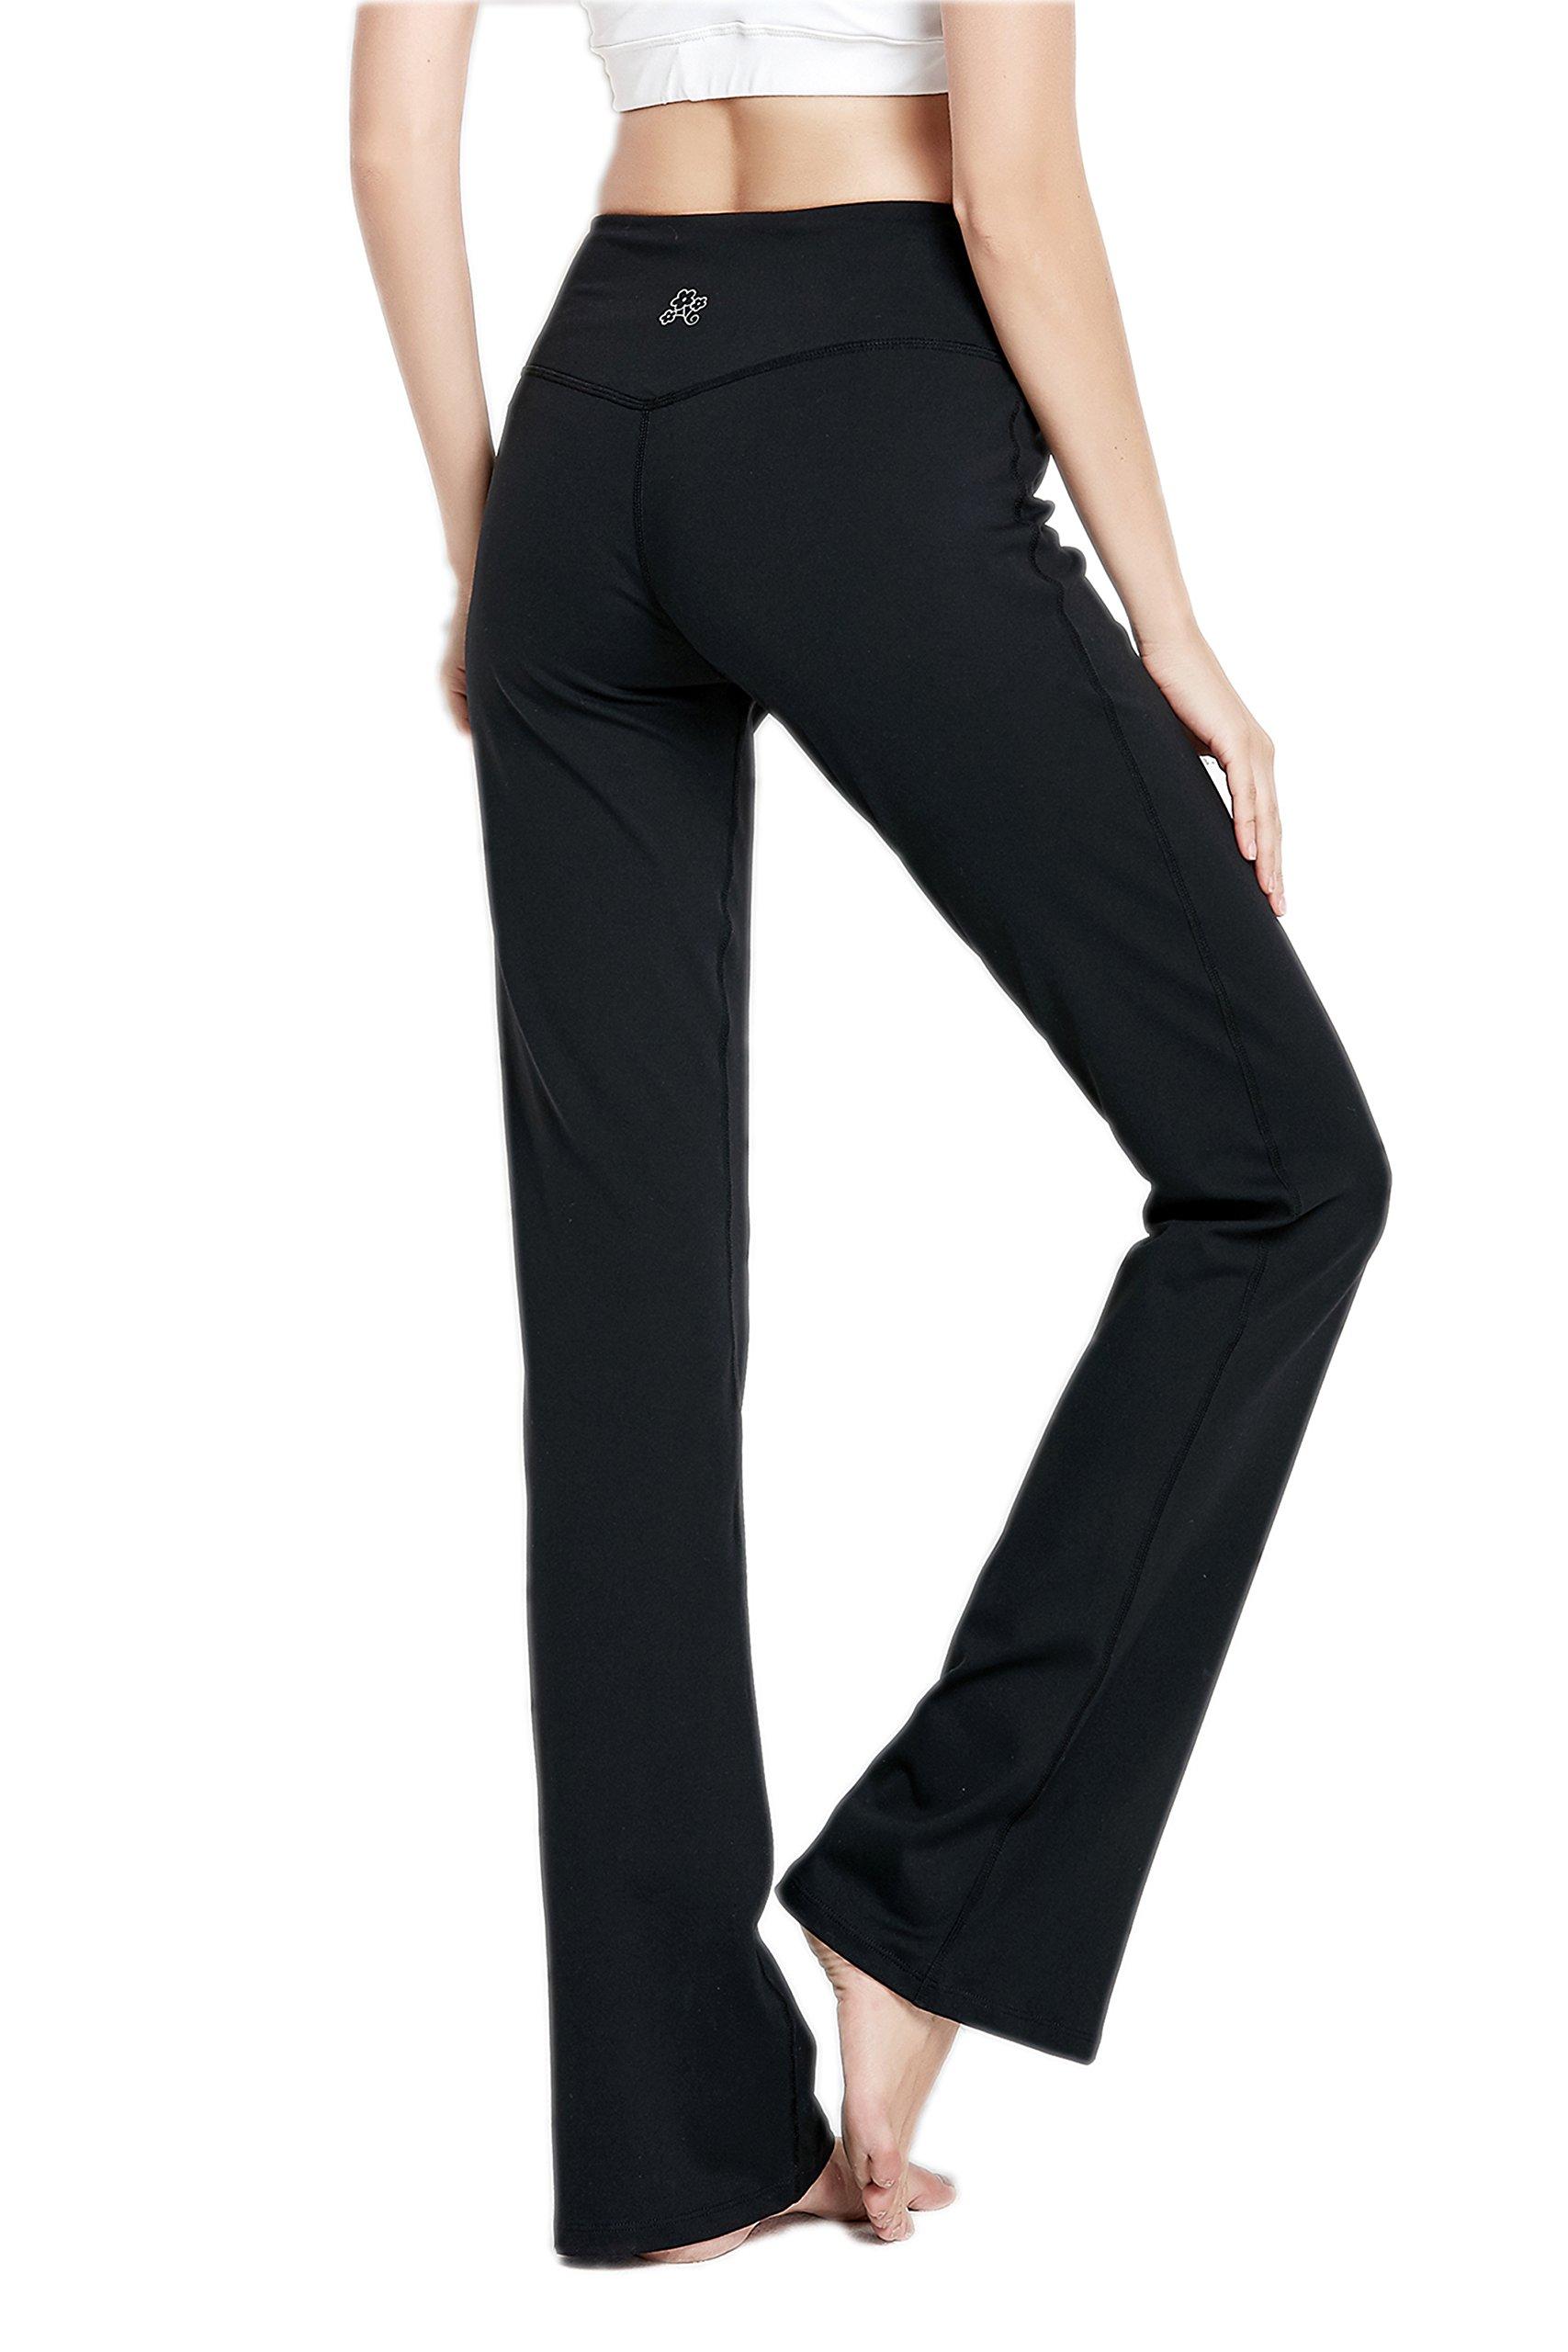 VIGORPACE 31'' Inseam Length Women's Bootcut Yoga Pants Long Bootleg Flare Pants Inner Hidden Pocket(XS)